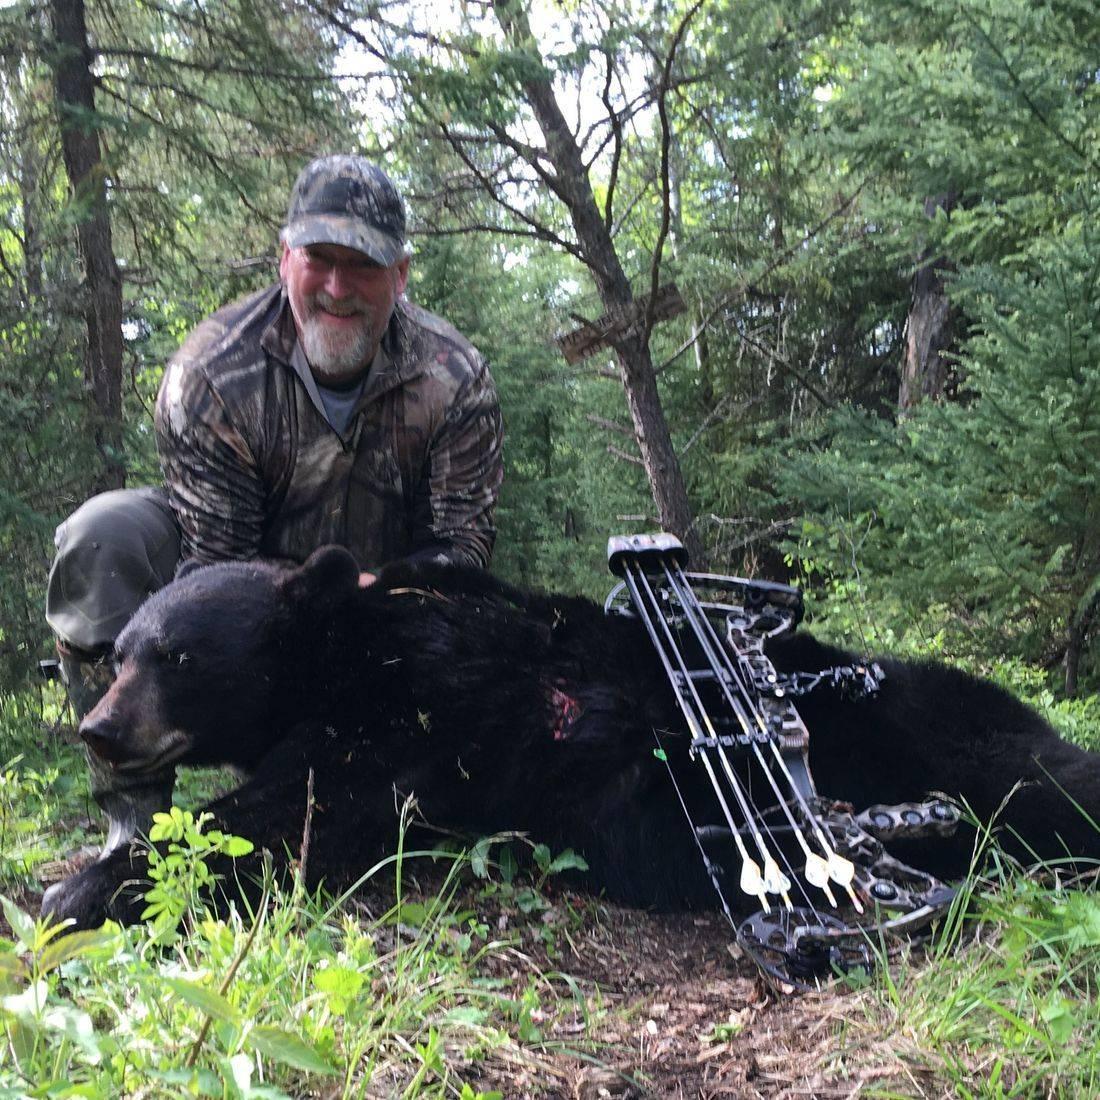 bear hunting, black bears, hunting, Manitoba Canada, Outifitters